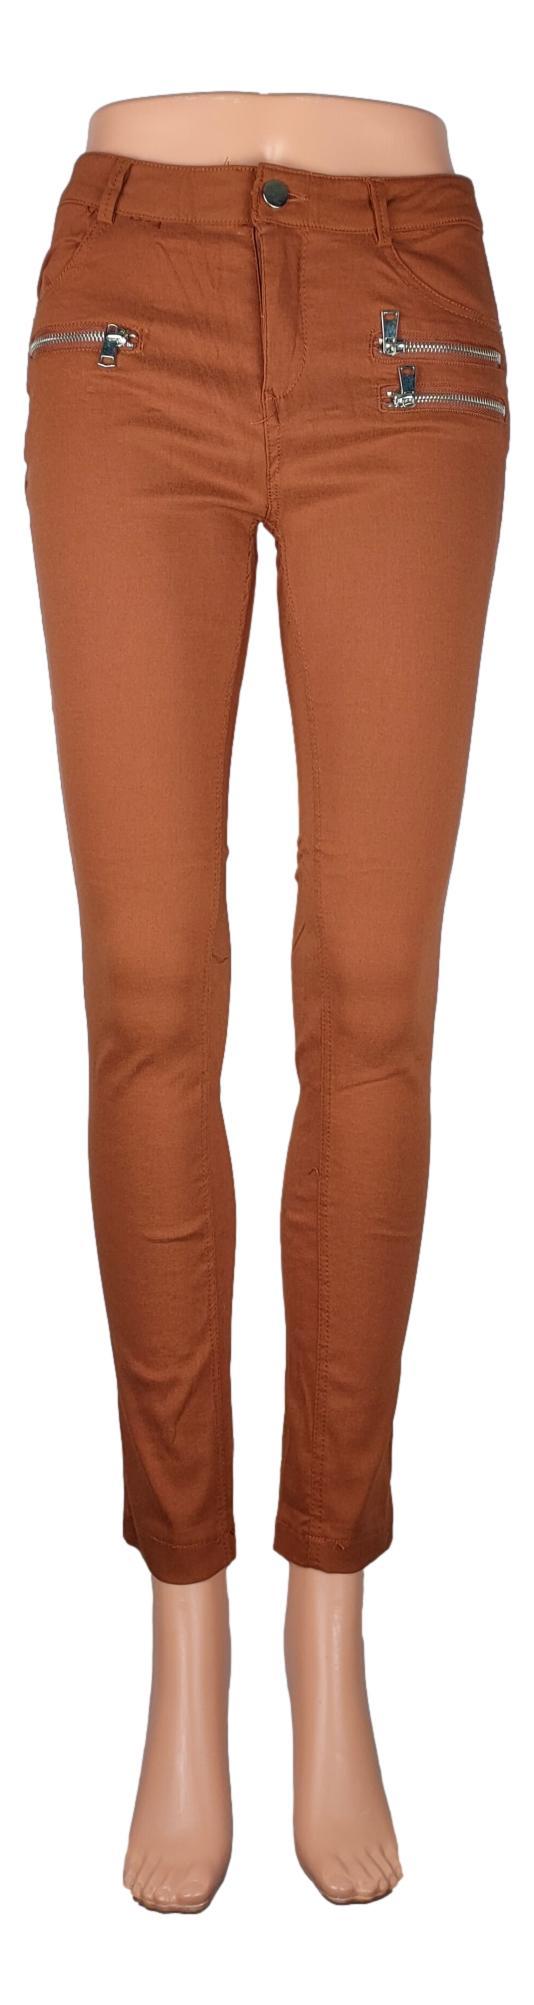 Pantalon MIM - Taille 38